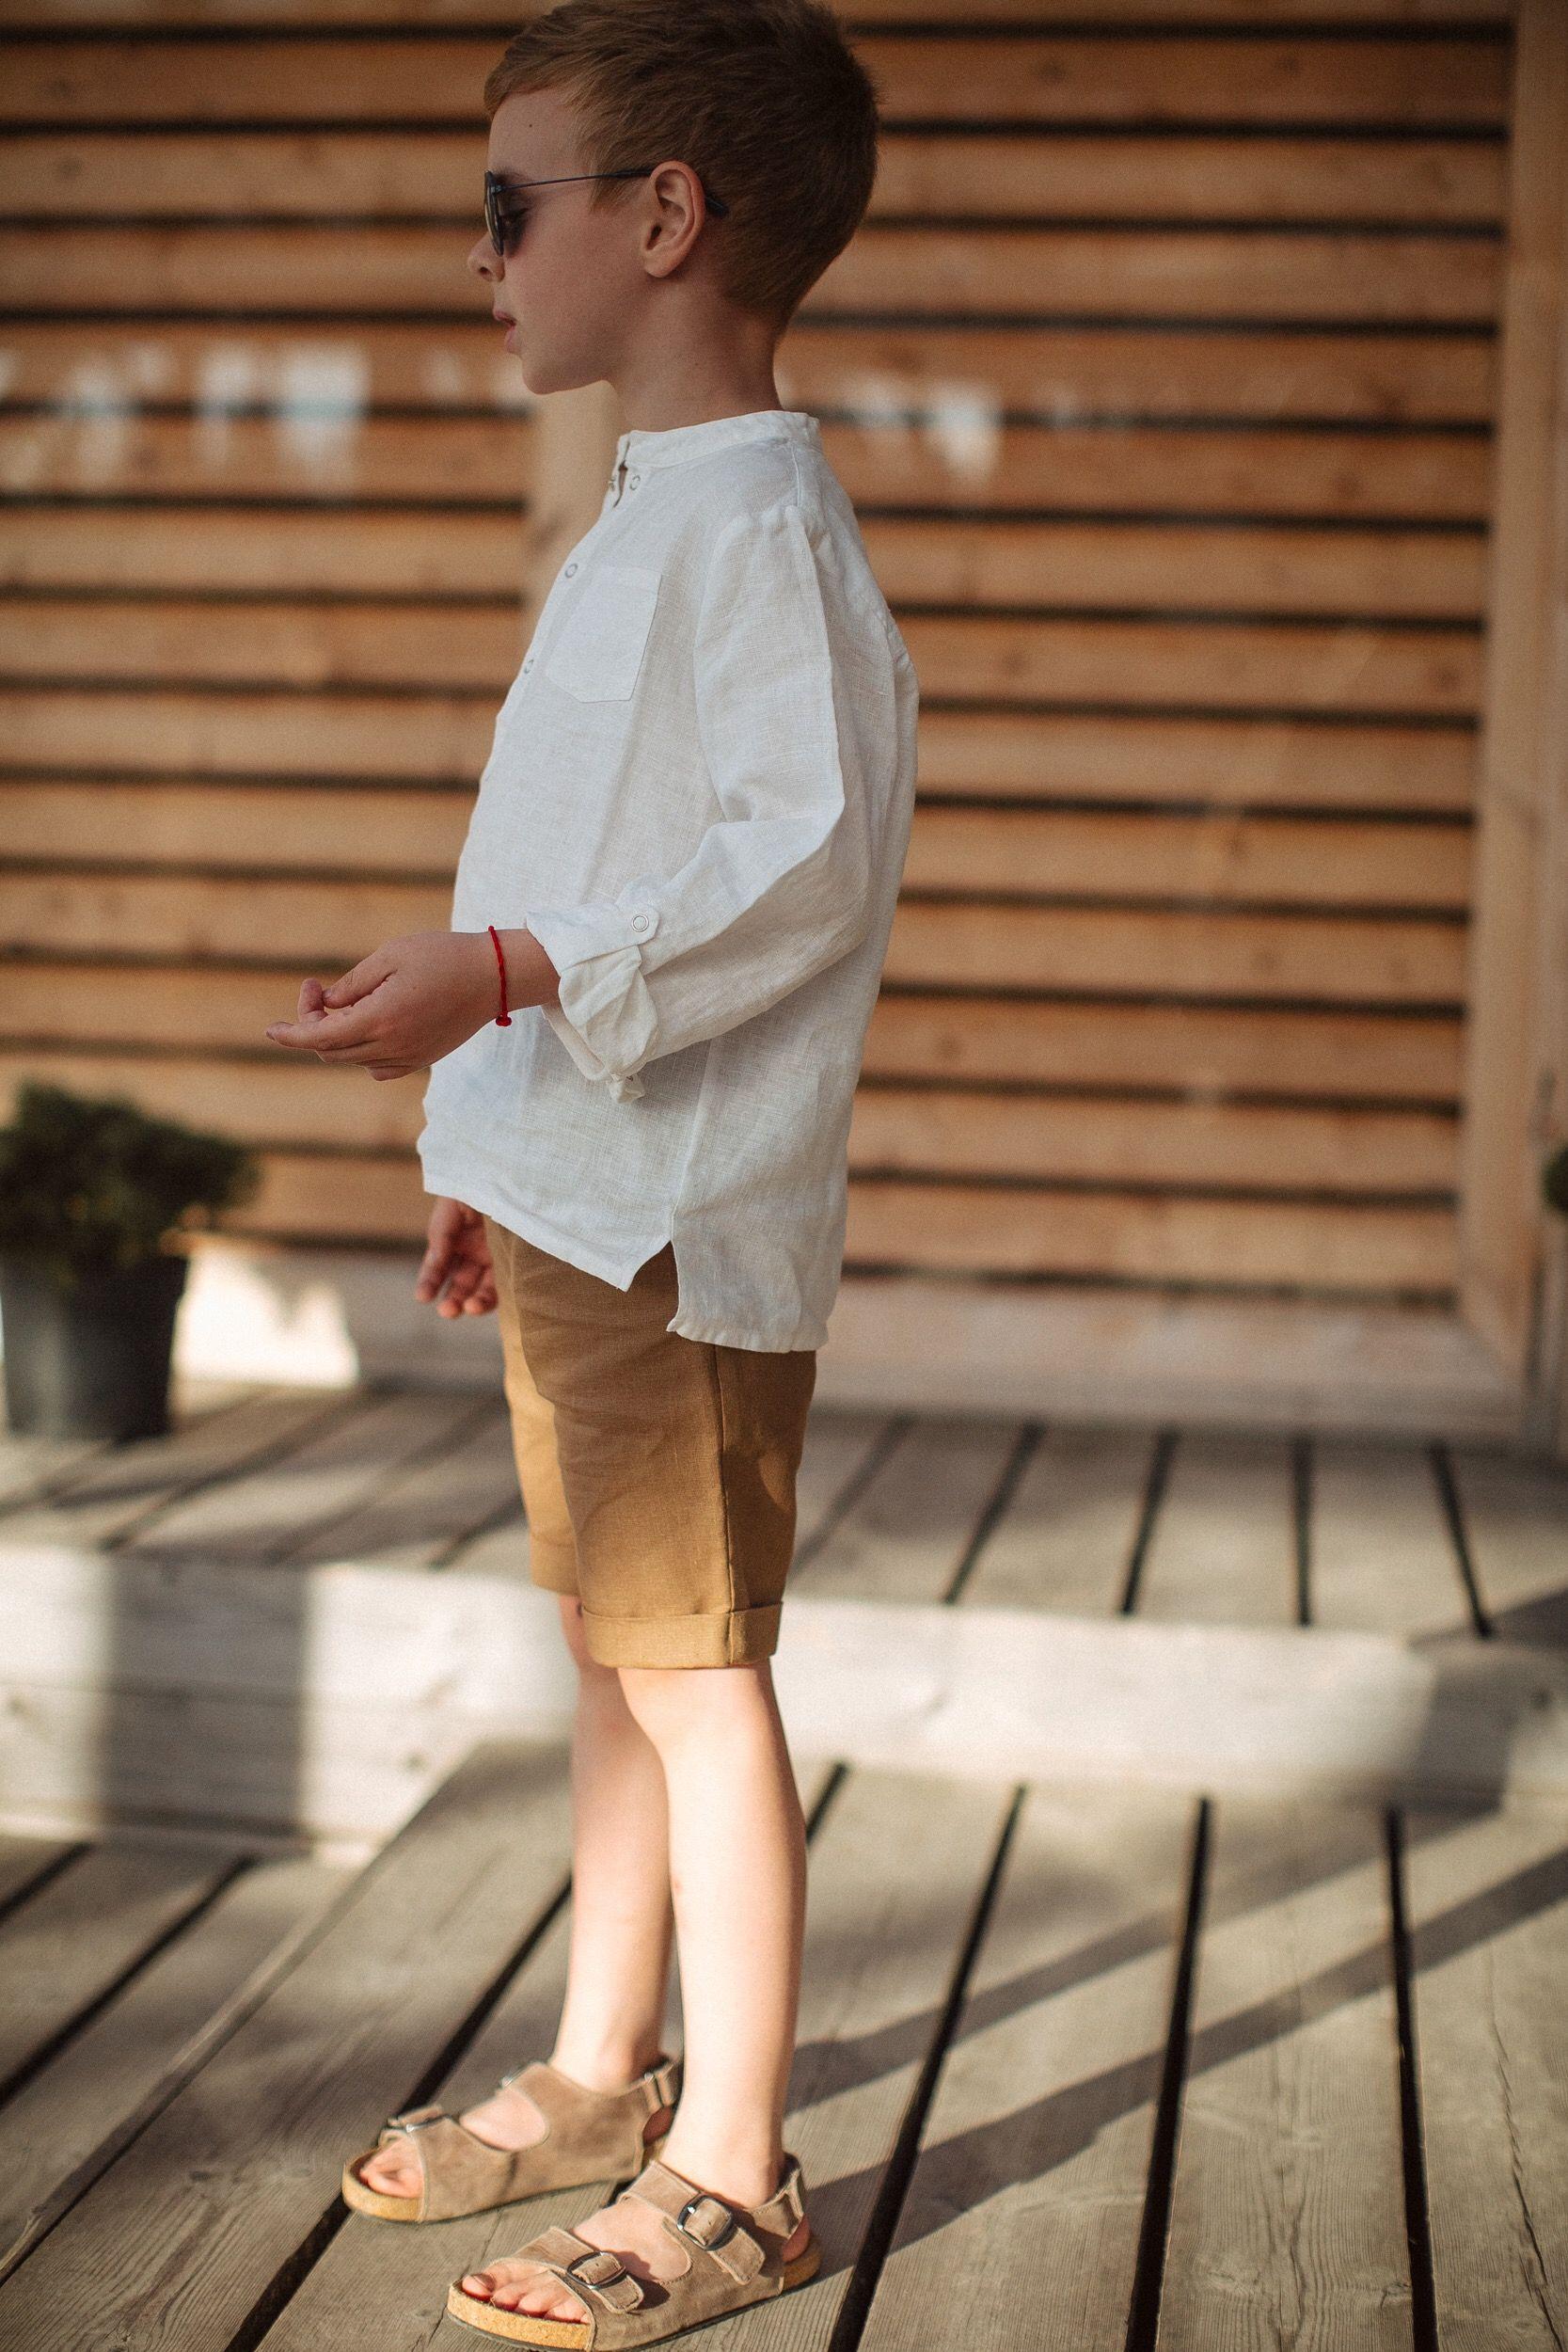 White Linen Shirt With Snaps For Boys Denim Shirt Mandarin Collar Shirt Long Sleeve Linen Shirt Boys Dress Shirt In 2021 Boys Denim Shirt Boys Dress Shirts Kids Clothes Boys [ 2500 x 1667 Pixel ]